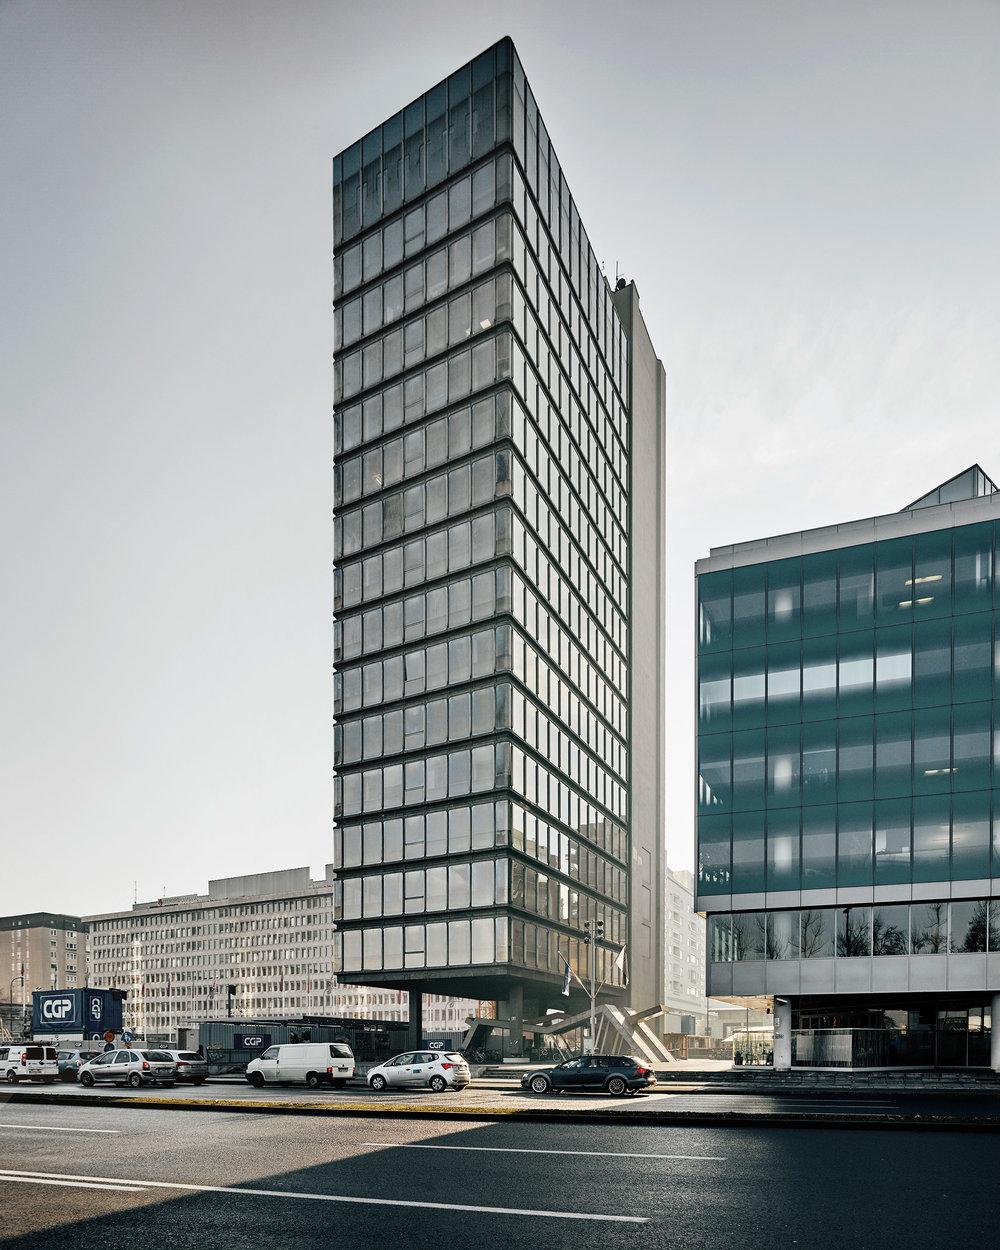 valentin-jeck-photographs-moma-toward-a-concrete-utopia-architecture-yugoslavia_dezeen_2364_col_10.jpg